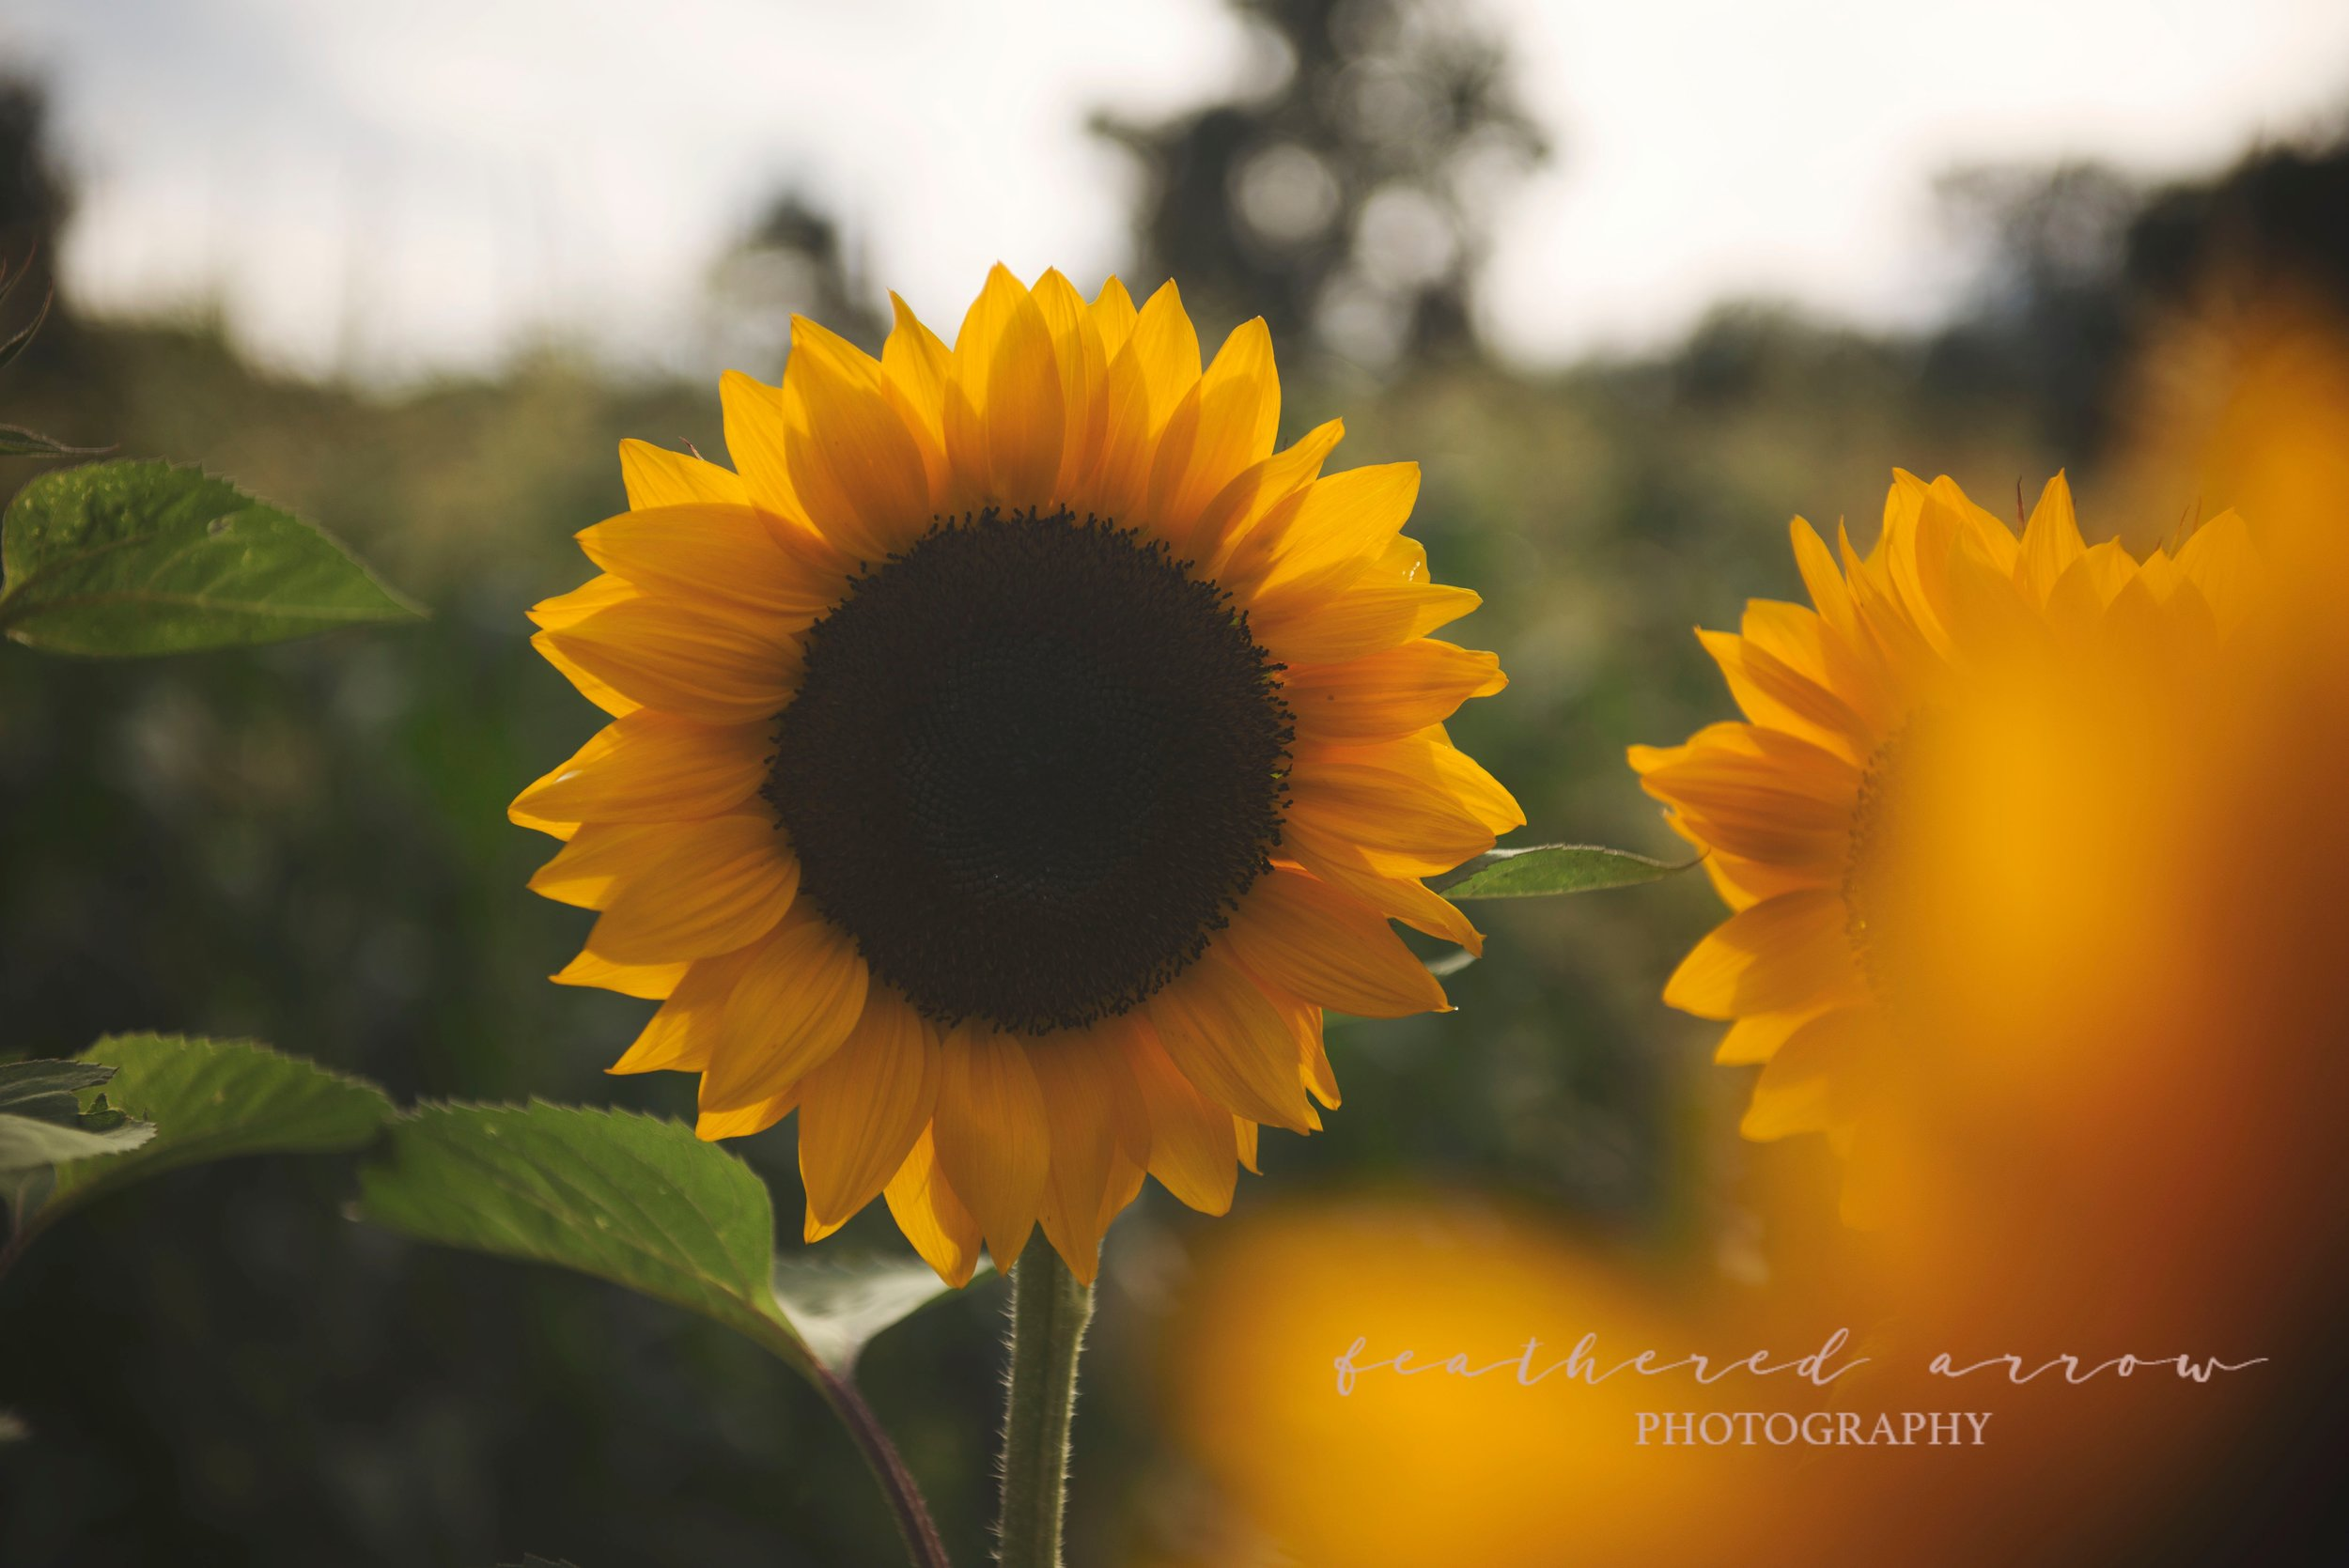 Mad Lizzie's Flower Farm U-Pick Sunflowers in Cross Plains, WI